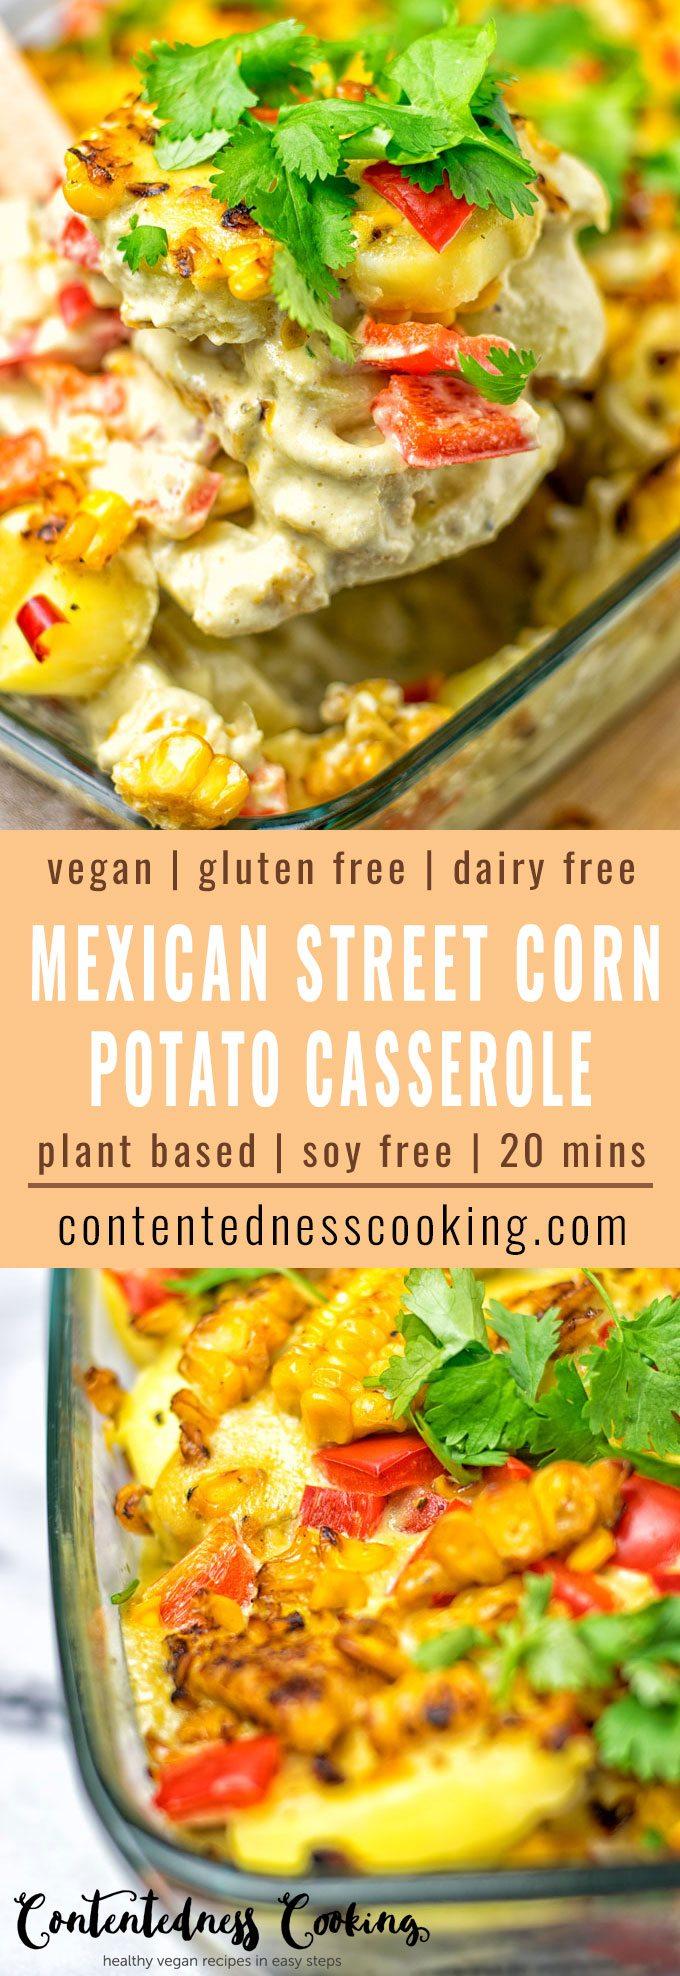 Mexican Street Corn Potato Casserole   #vegan #glutenfree #contentednesscooking #plantbased